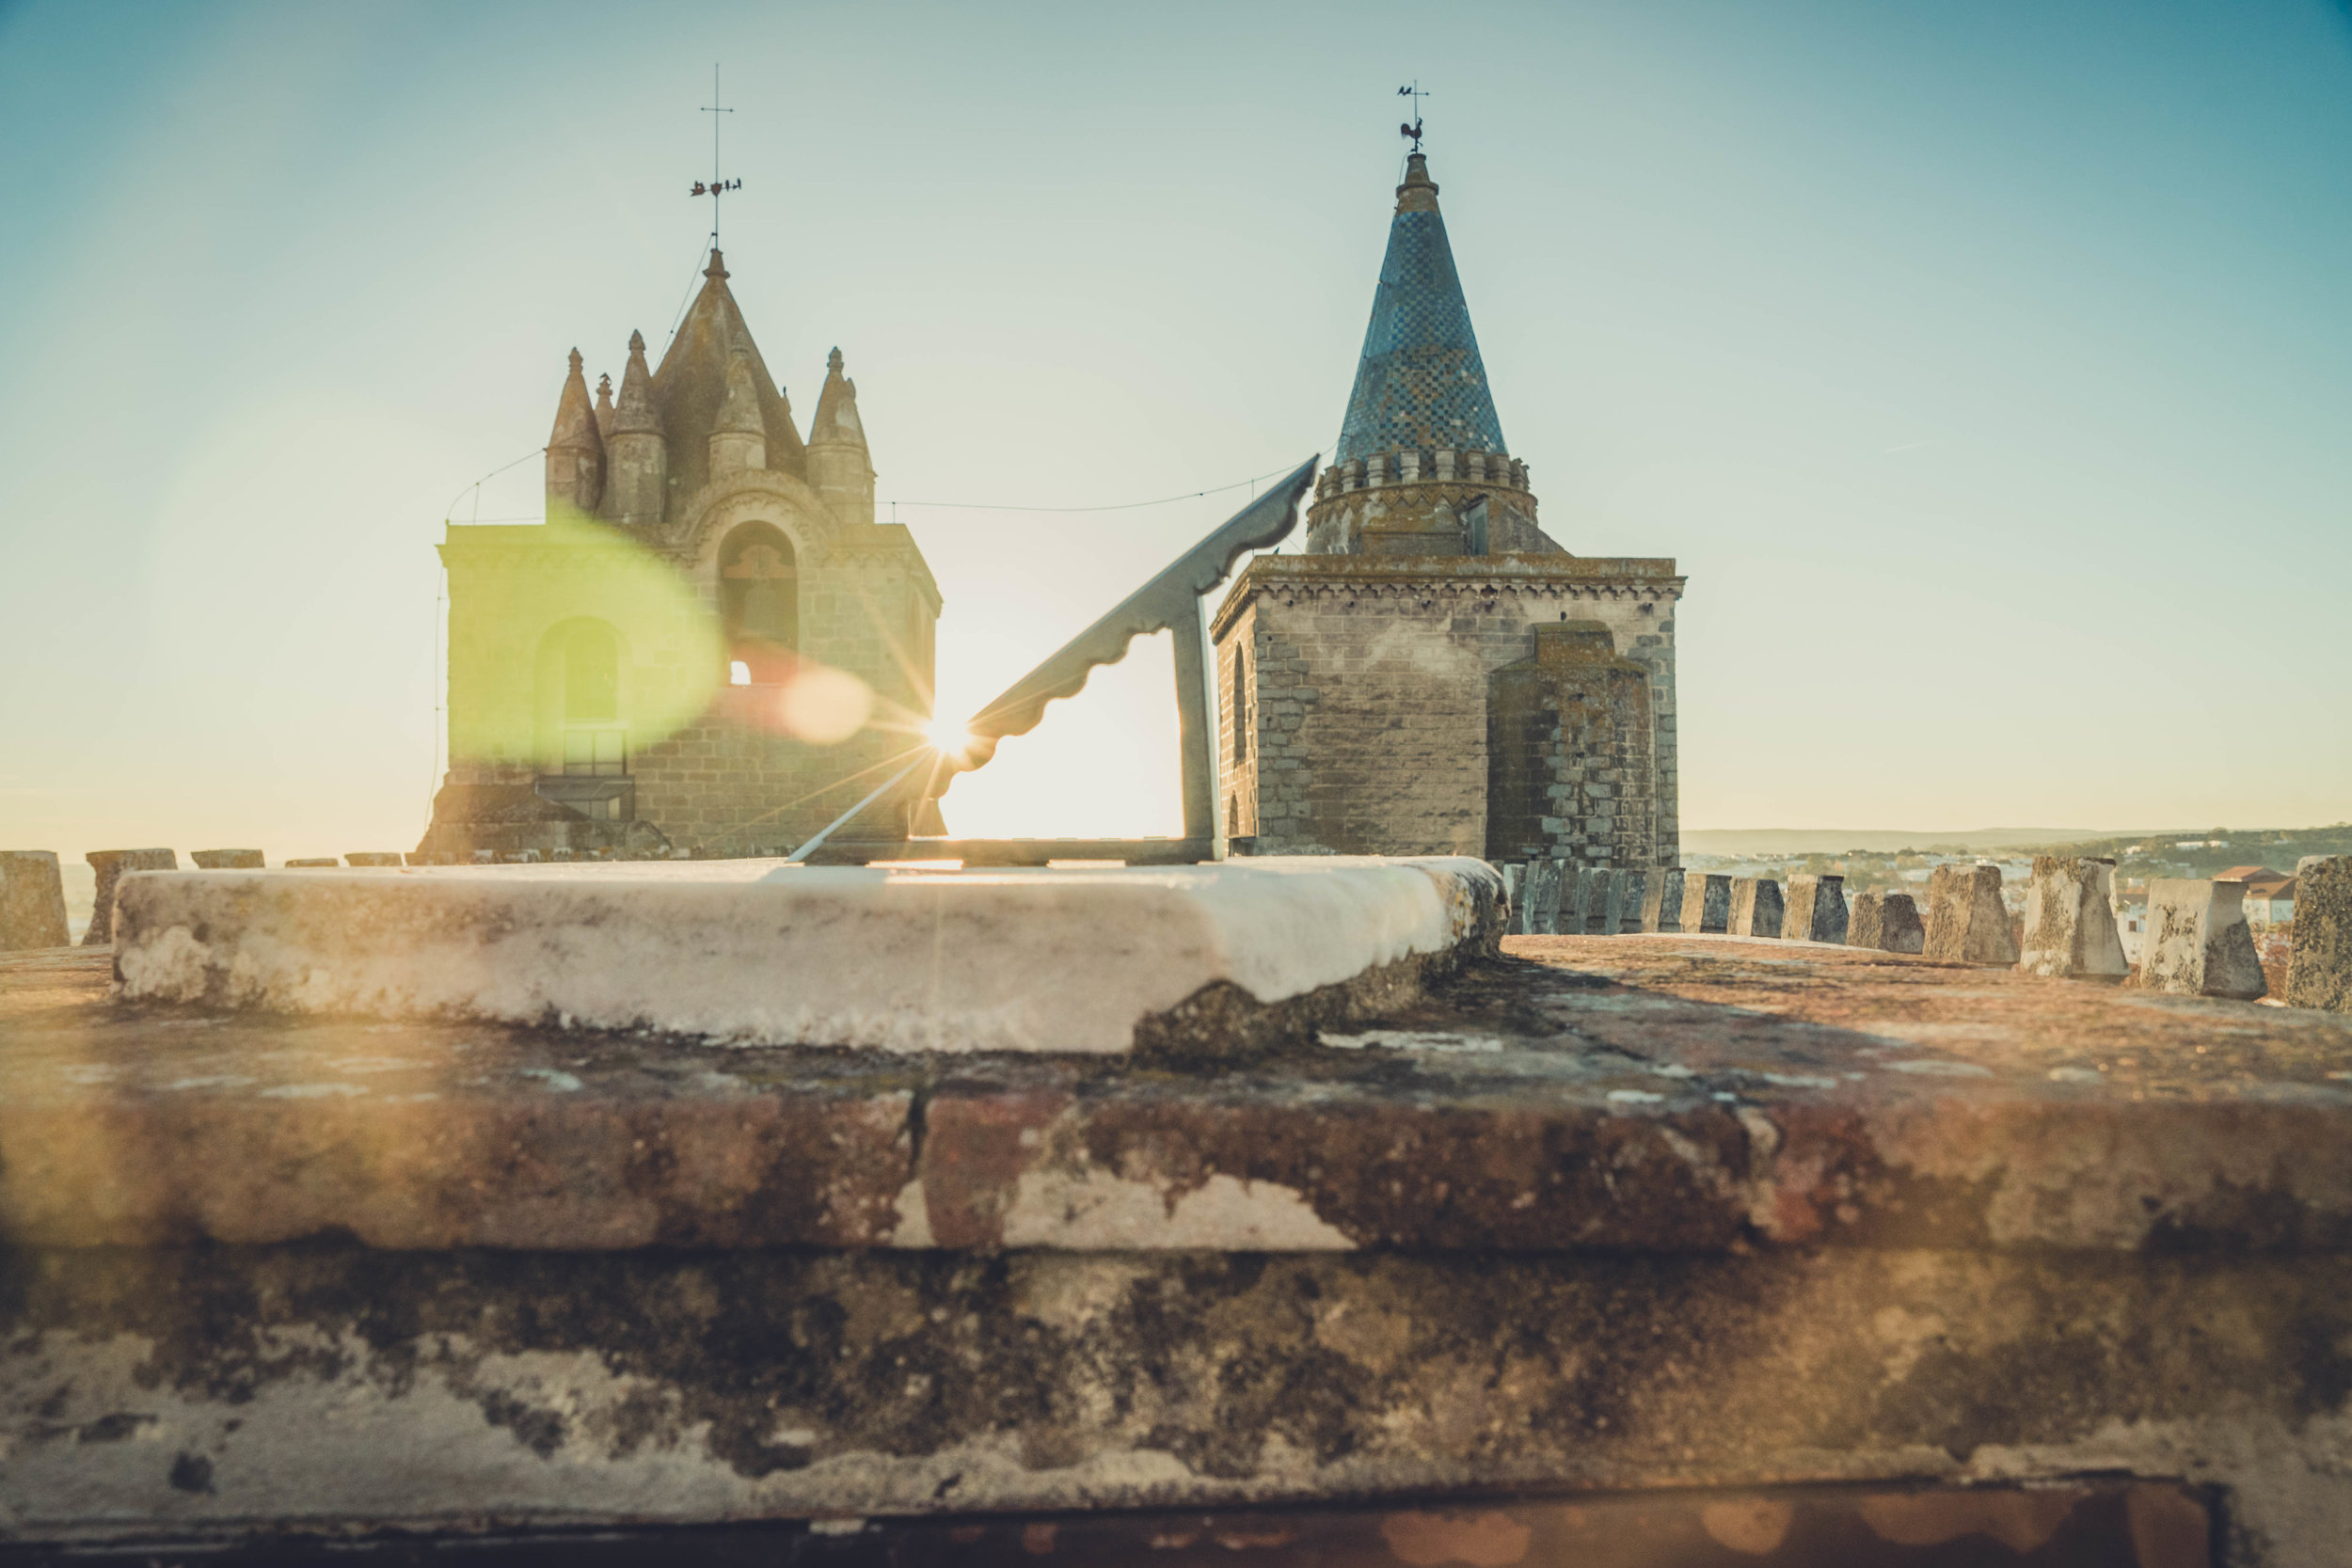 Evora. Roman Ruins. Portugal. Alentejo. Piliers. Roman city. ancient roman town. Blue sky. travel. adventure. history. historical. wine. architecture. sun dial.jpg